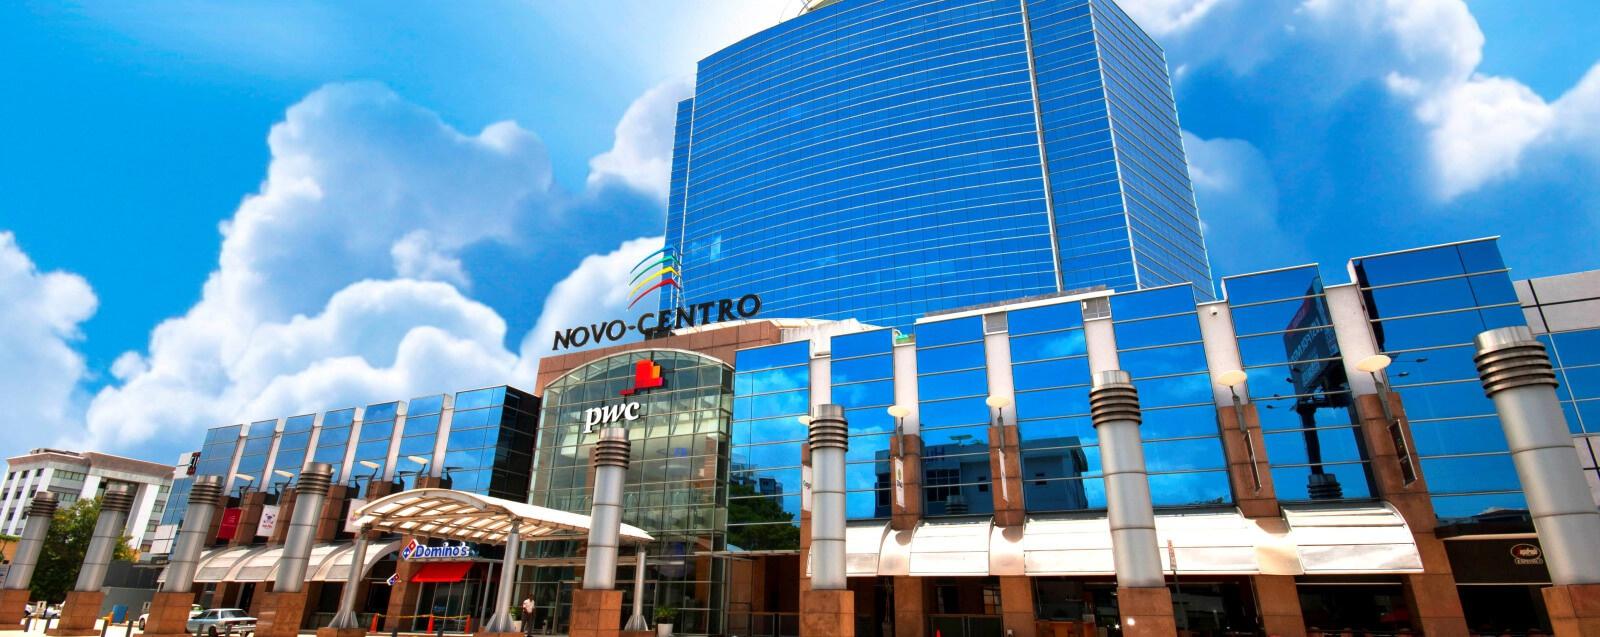 Novo Centro Santo Domingo